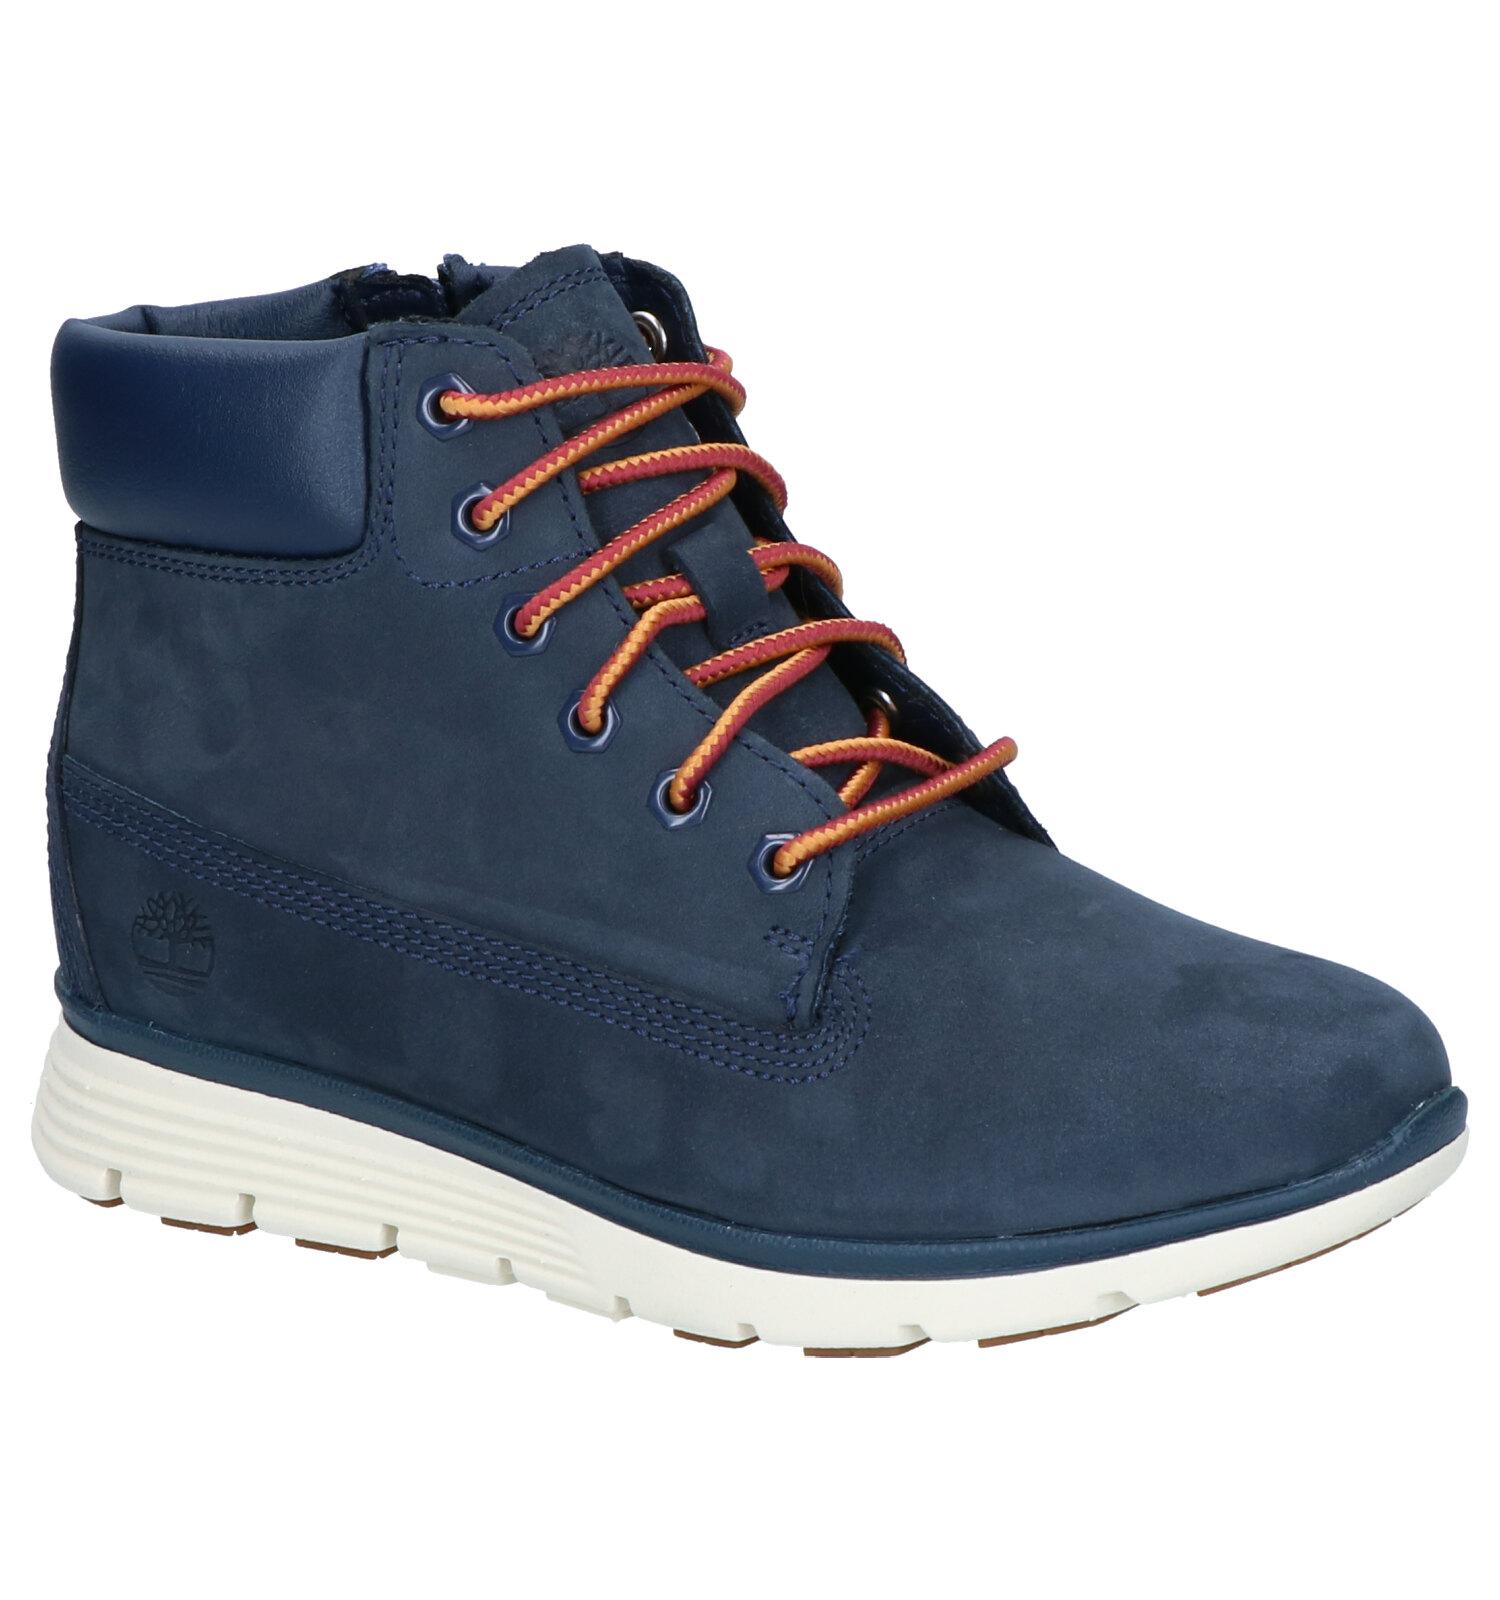 Timberland Killington 6 Inch Blauwe Boots   SCHOENENTORFS.NL   Gratis verzend en retour